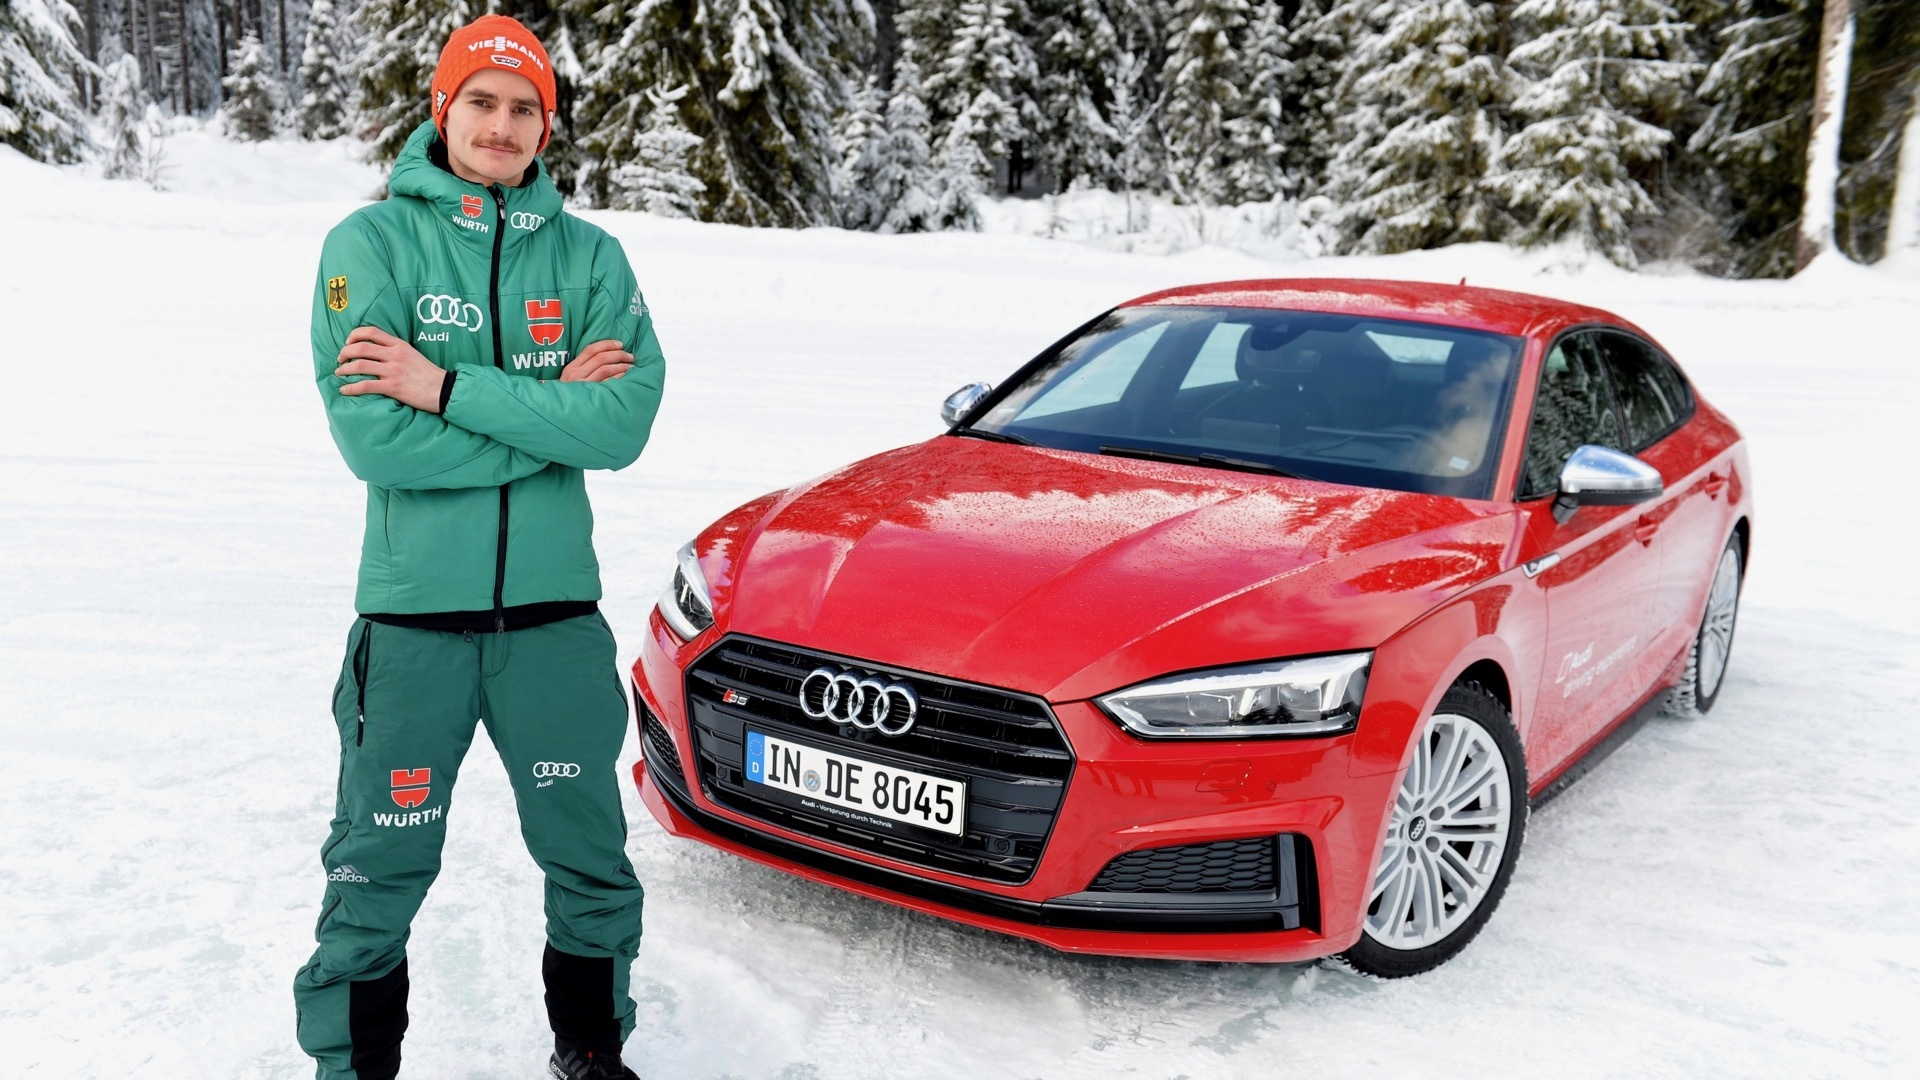 Deutsche Skispringer erleben Audi driving experience